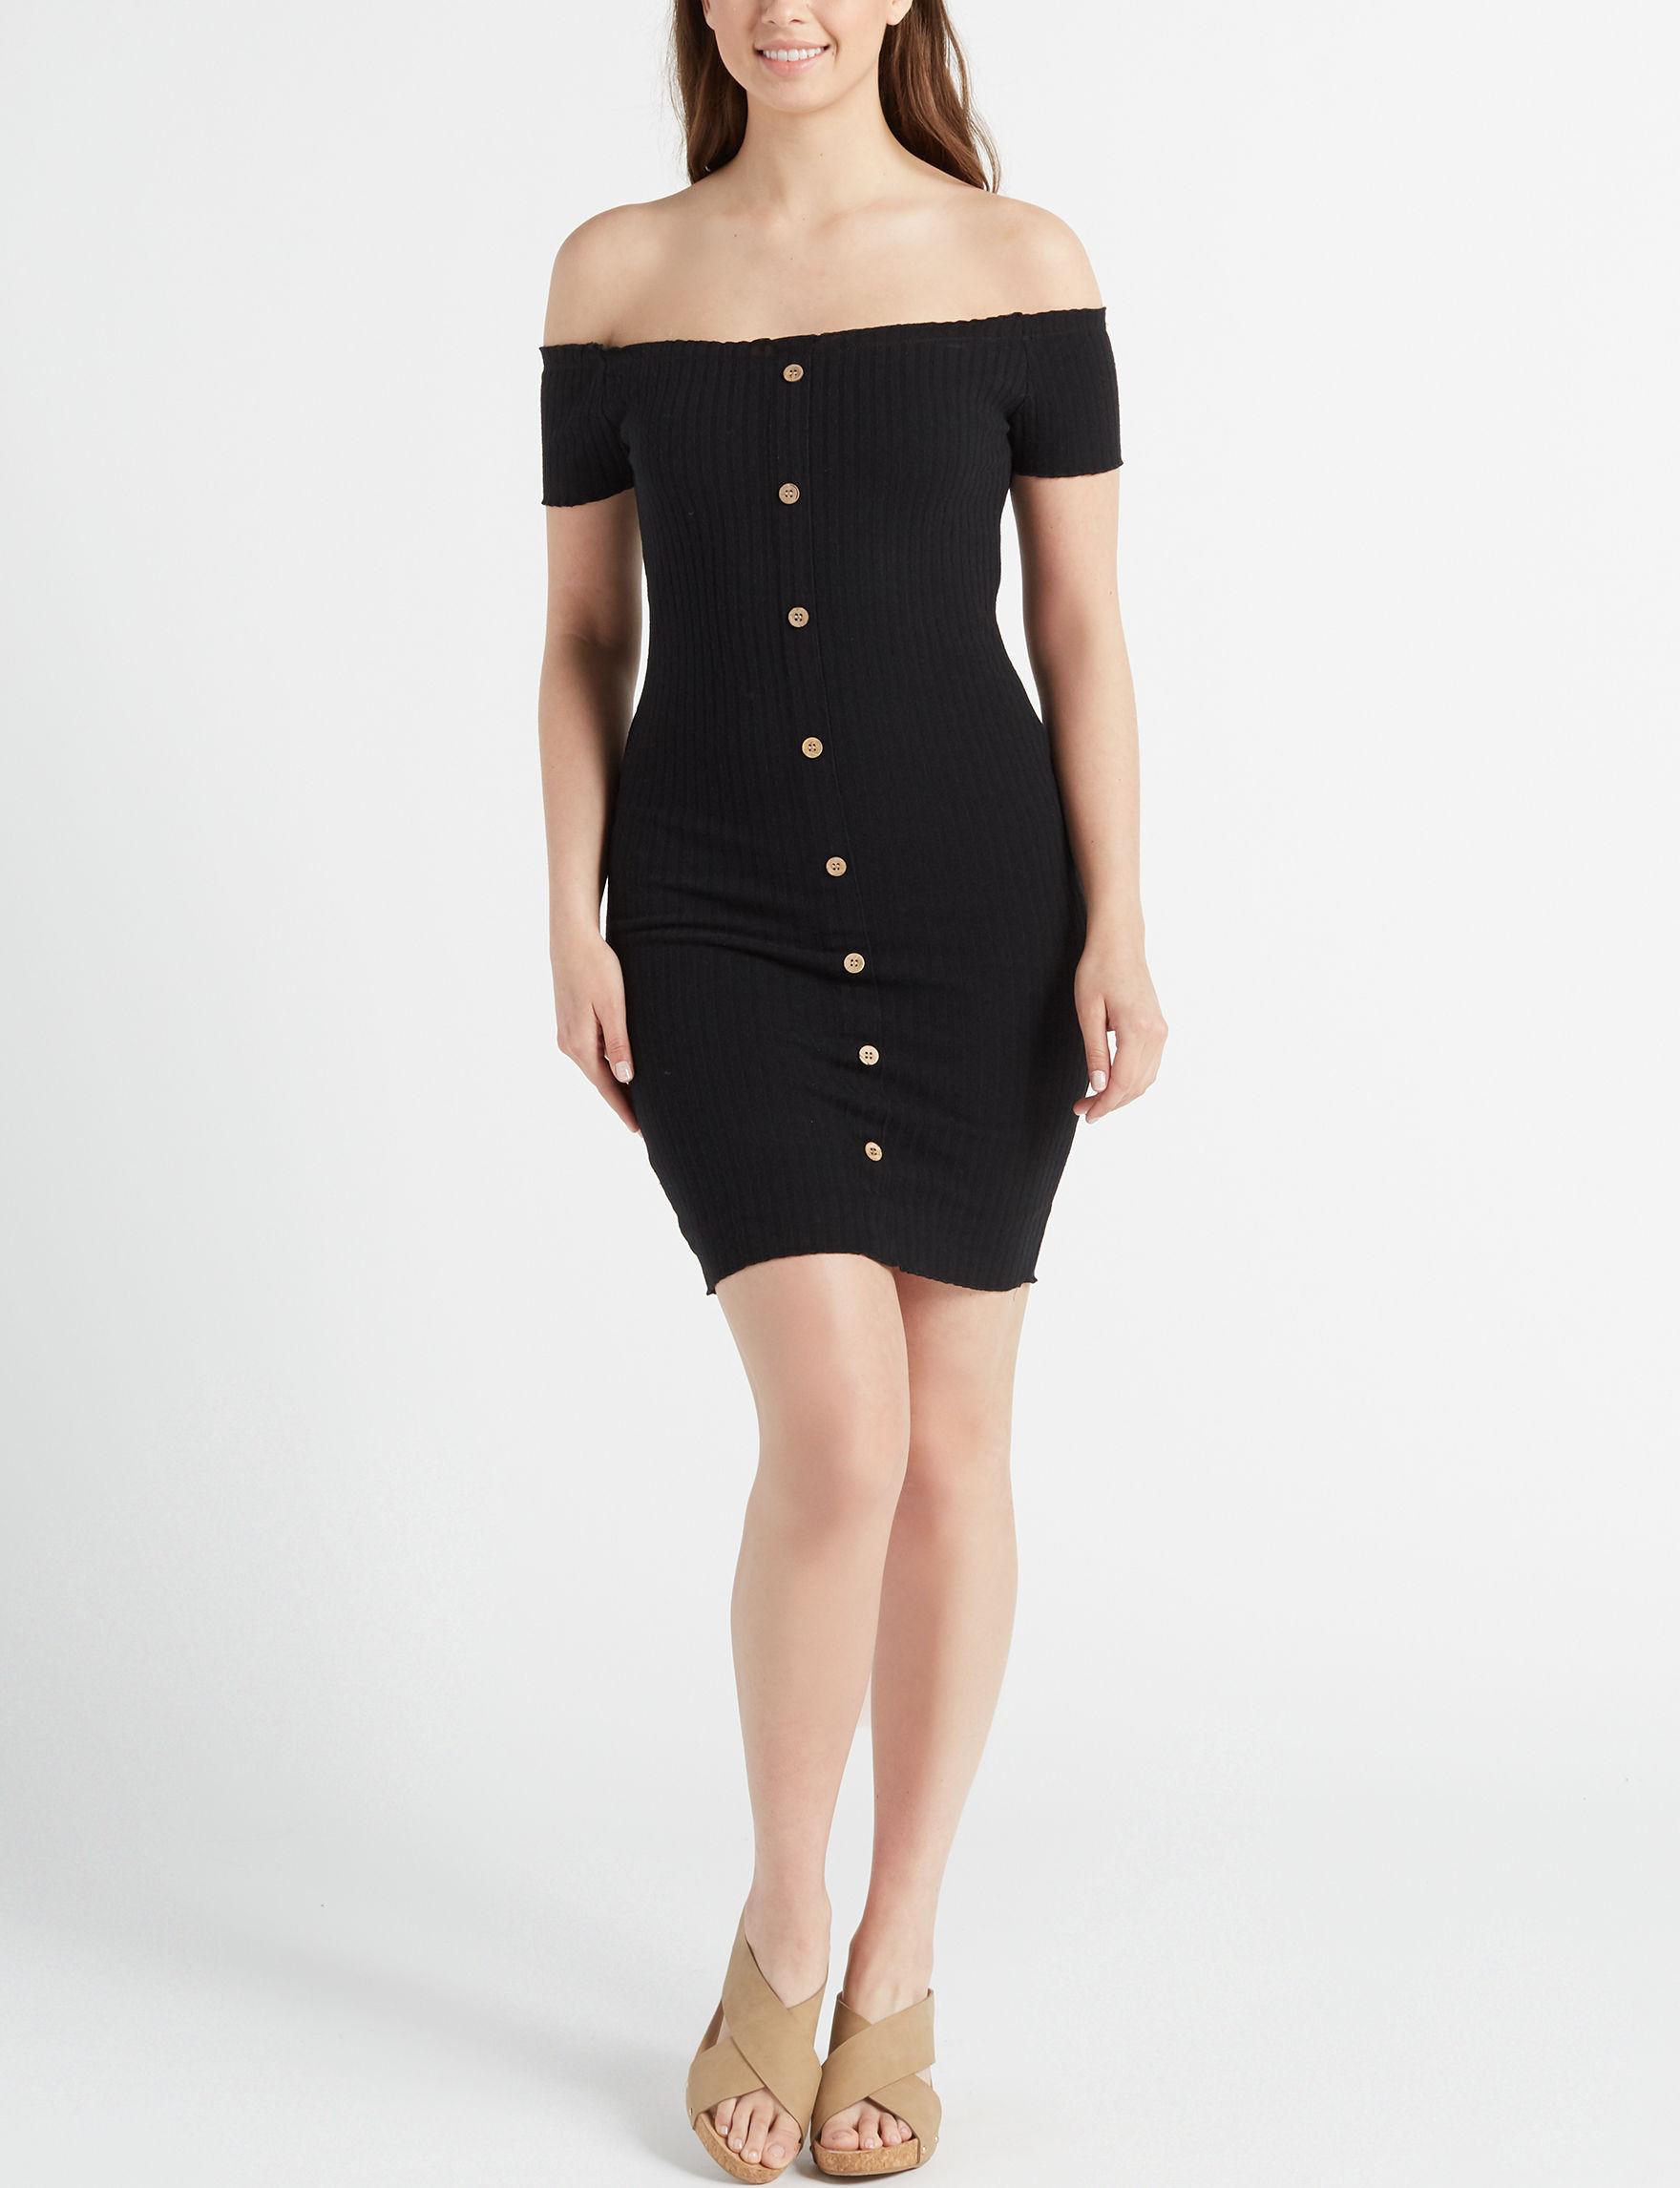 Wishful Park Black Everyday & Casual Bodycon Dresses